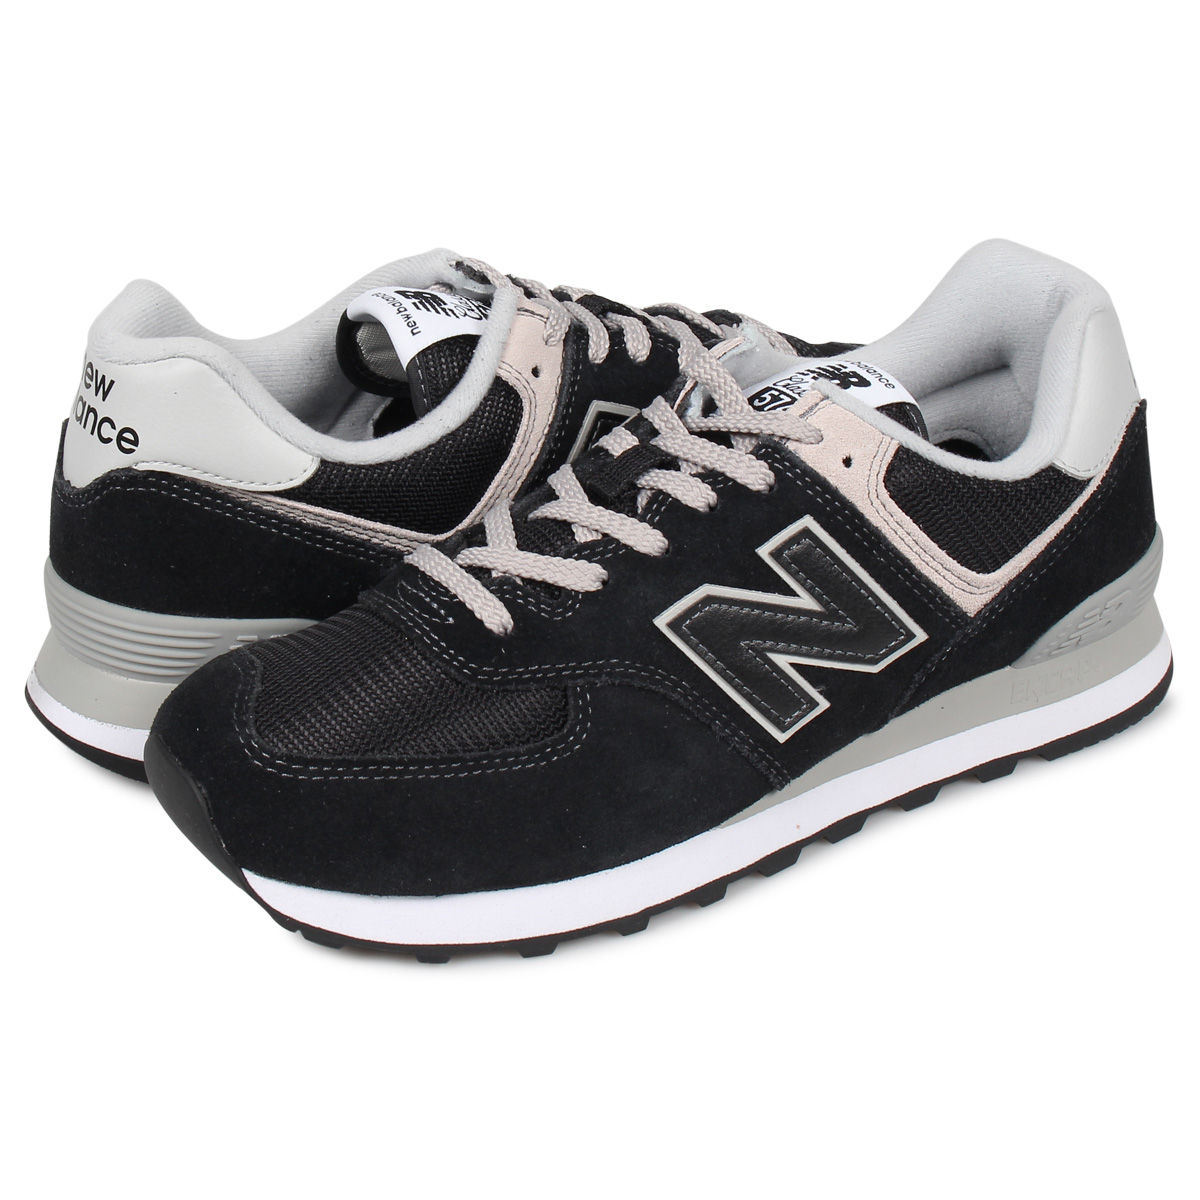 quality design 56f48 3eb05 new balance ML574EGK New Balance 574 sneakers men D Wise black black [8/20  Shinnyu load]